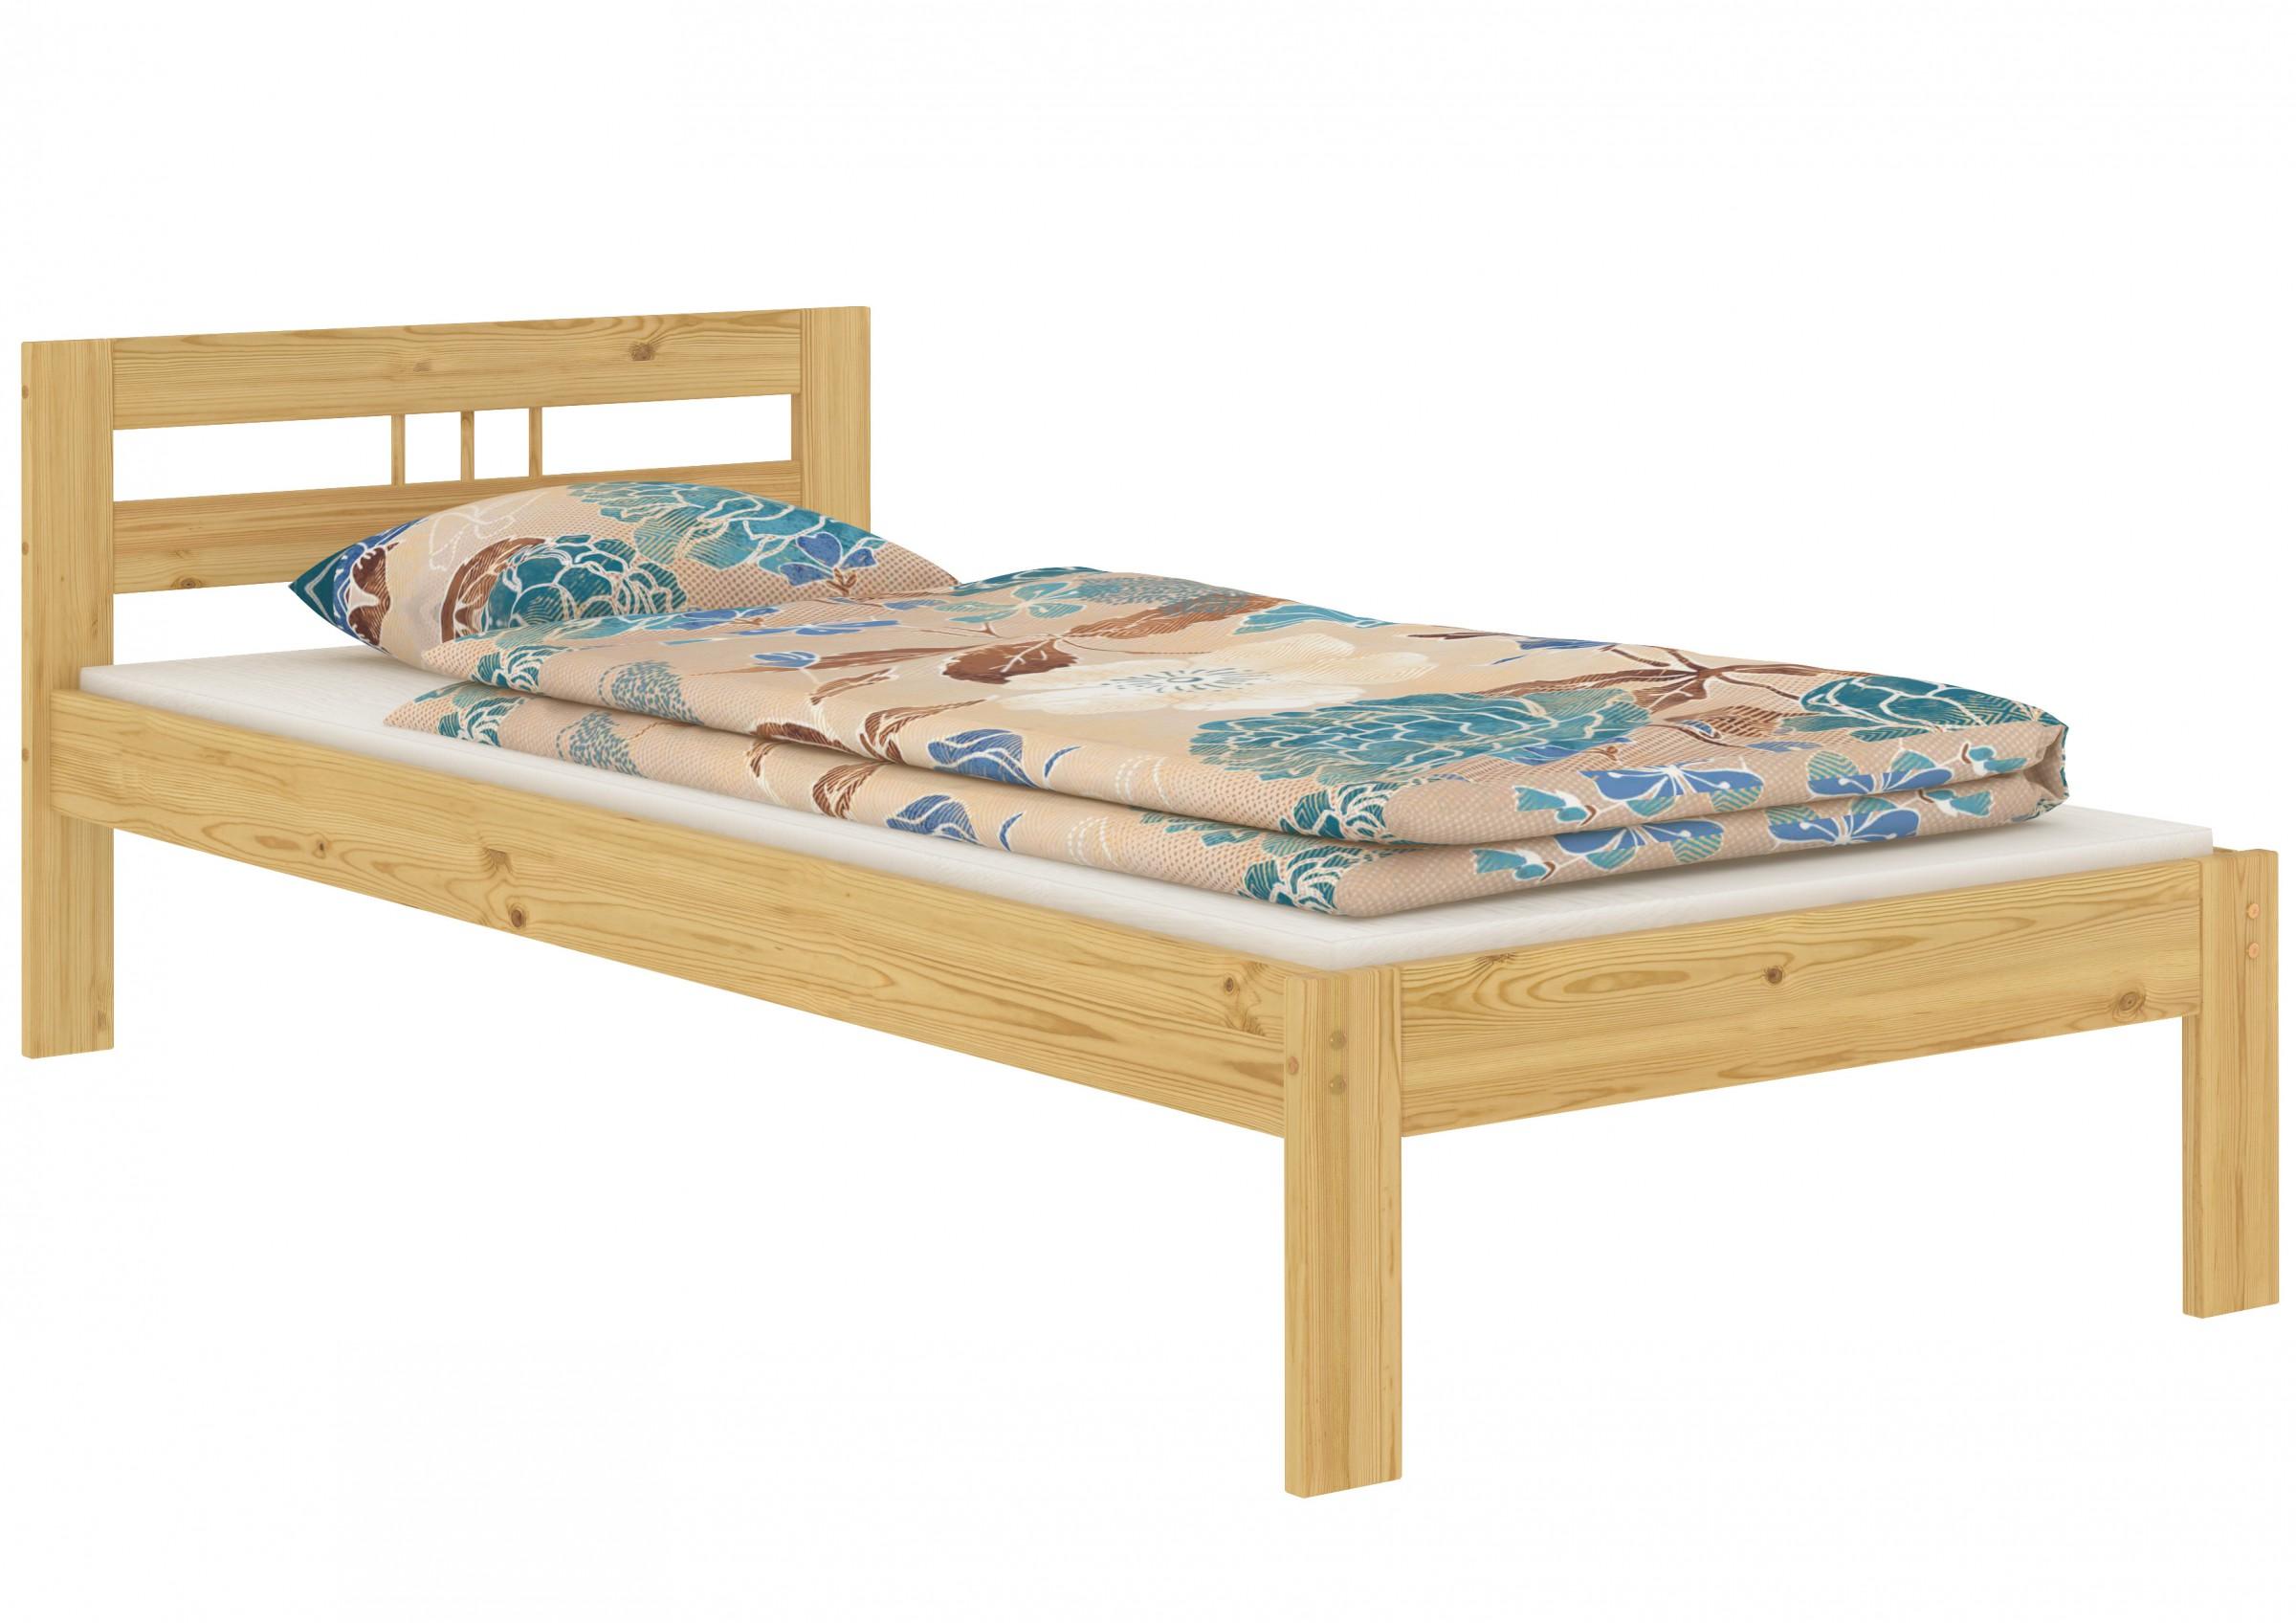 Cuna talla corta fut n cama pino 90x190 cama individual for Cama de 60 pulgadas